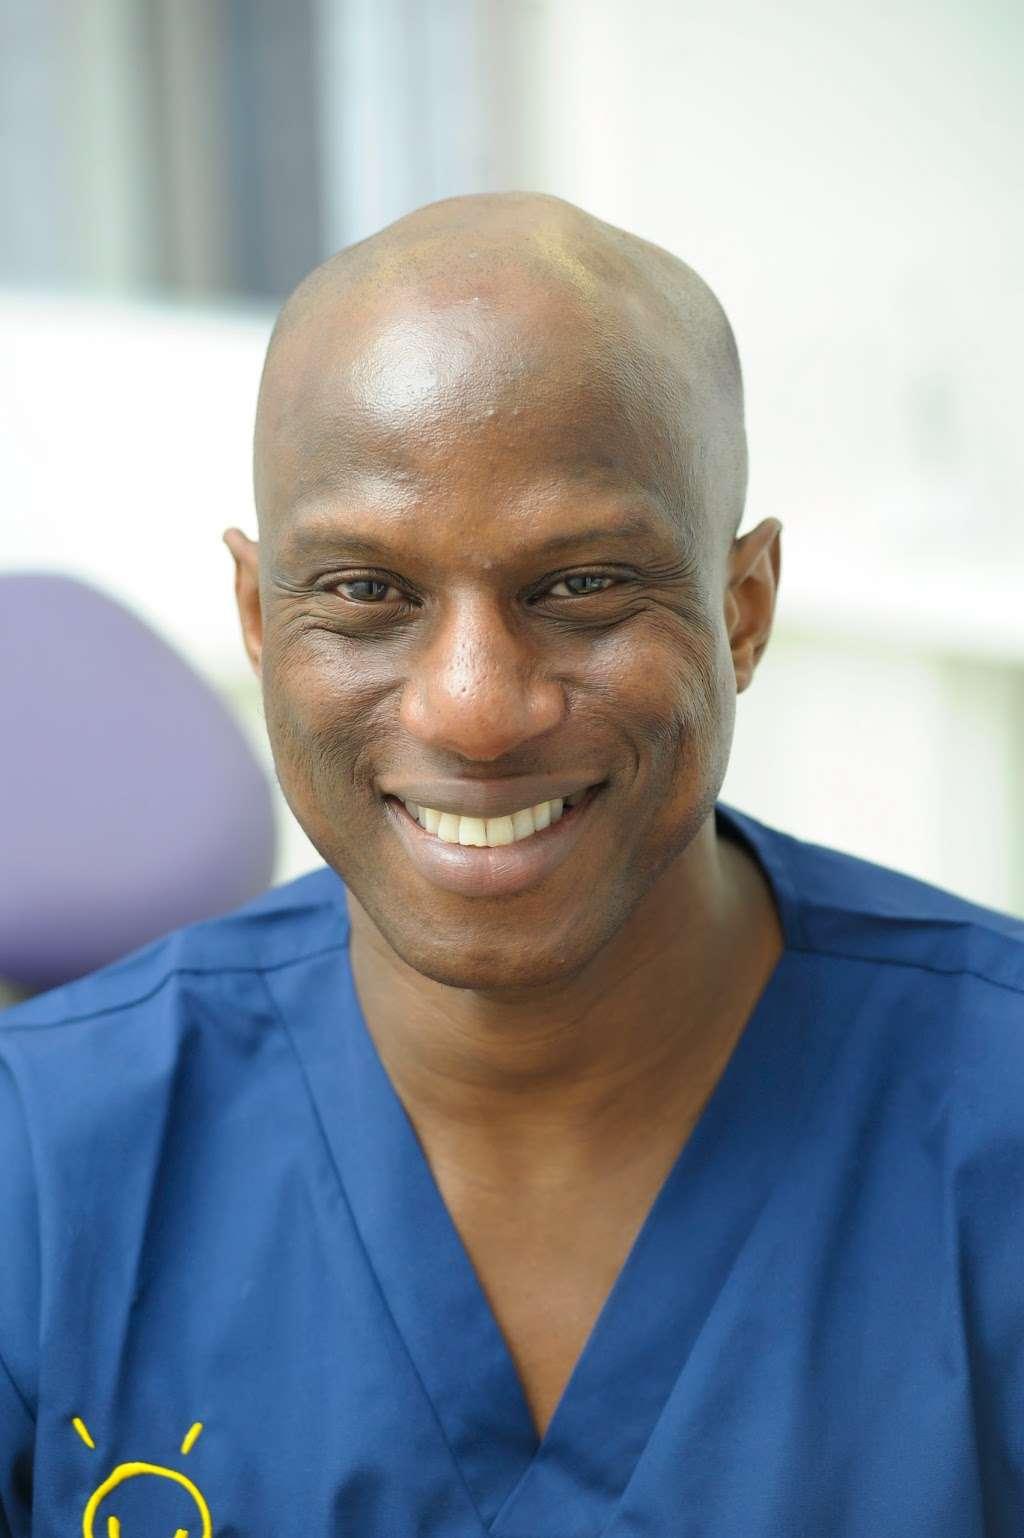 RUSTHALL DENTAL PRACTICE - dentist  | Photo 8 of 10 | Address: Rusthall Dental Surgery, 39 Meadow Rd, Rusthall, Tunbridge Wells TN4 8UN, UK | Phone: 01892 536598